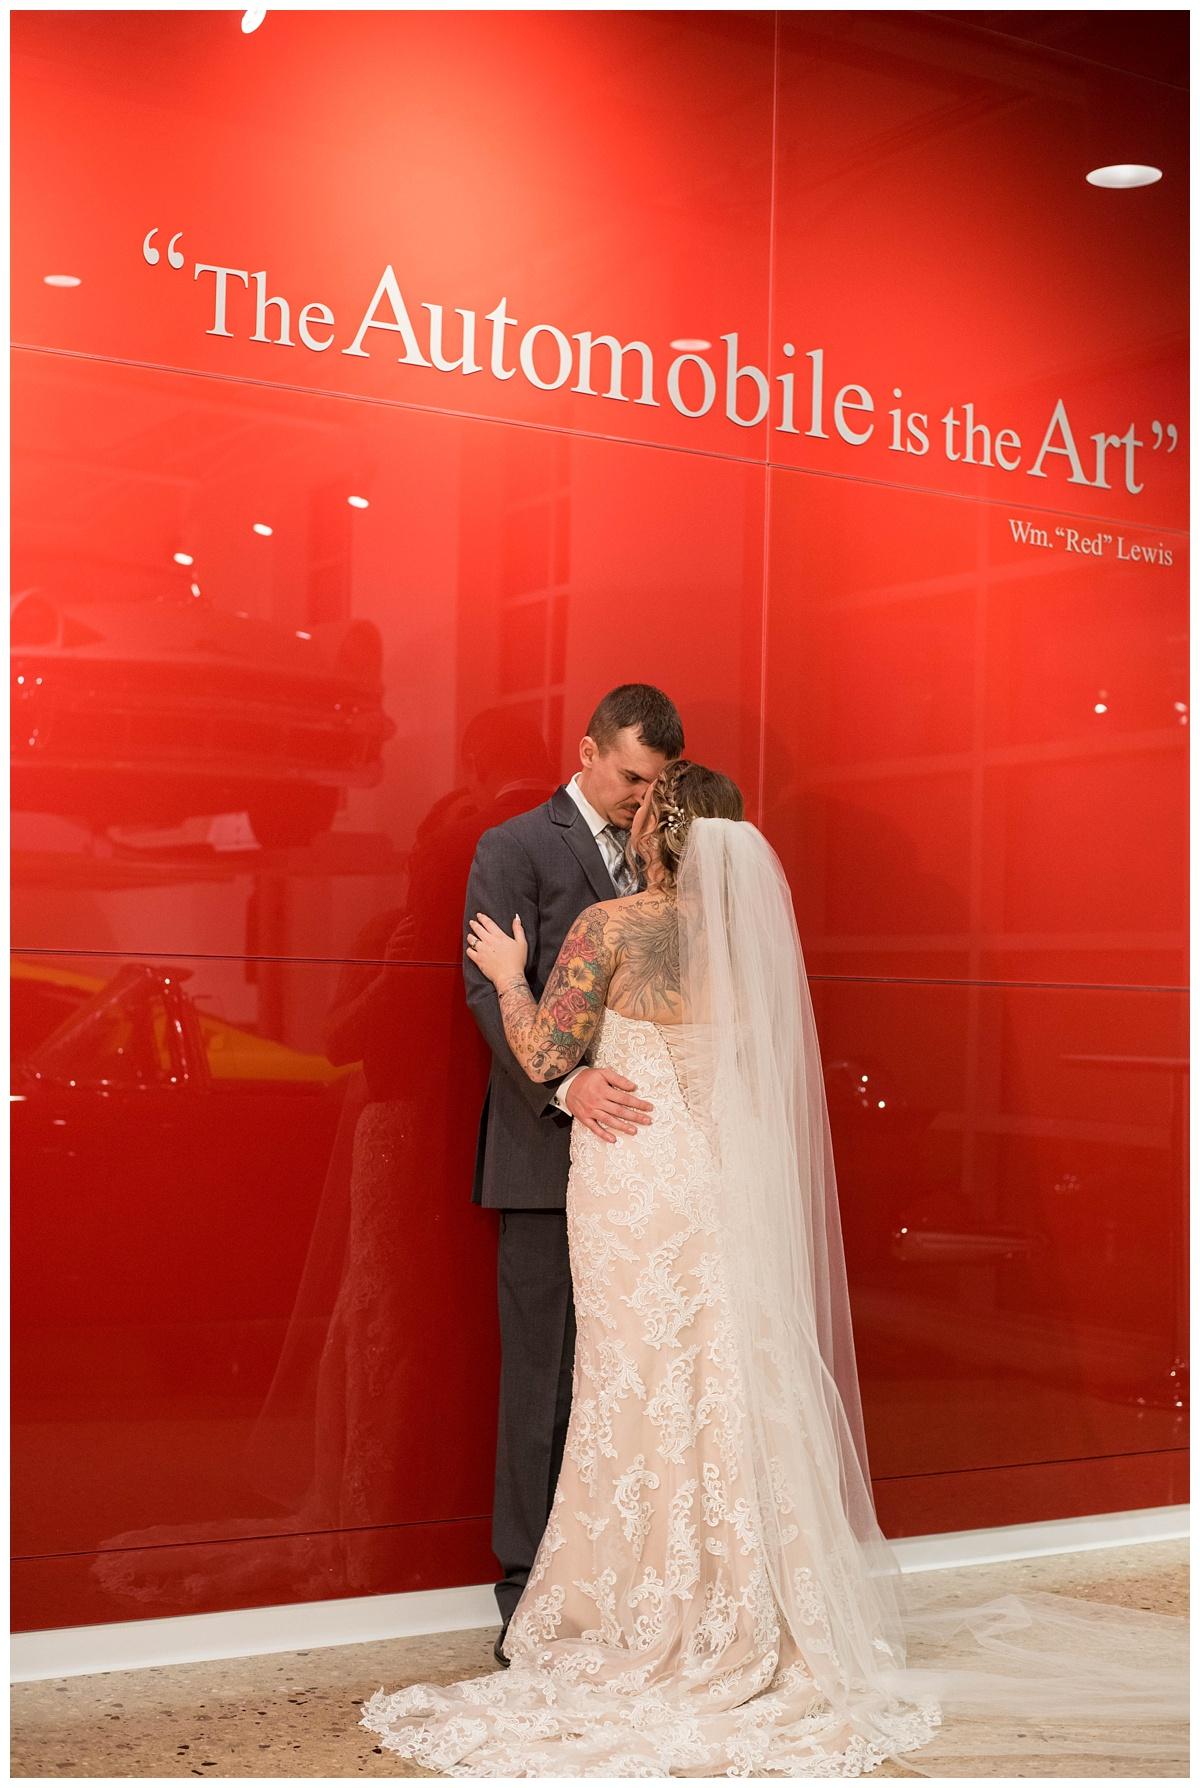 Fall Wedding at Automobile Gallery Green Bay WI_0035.jpg